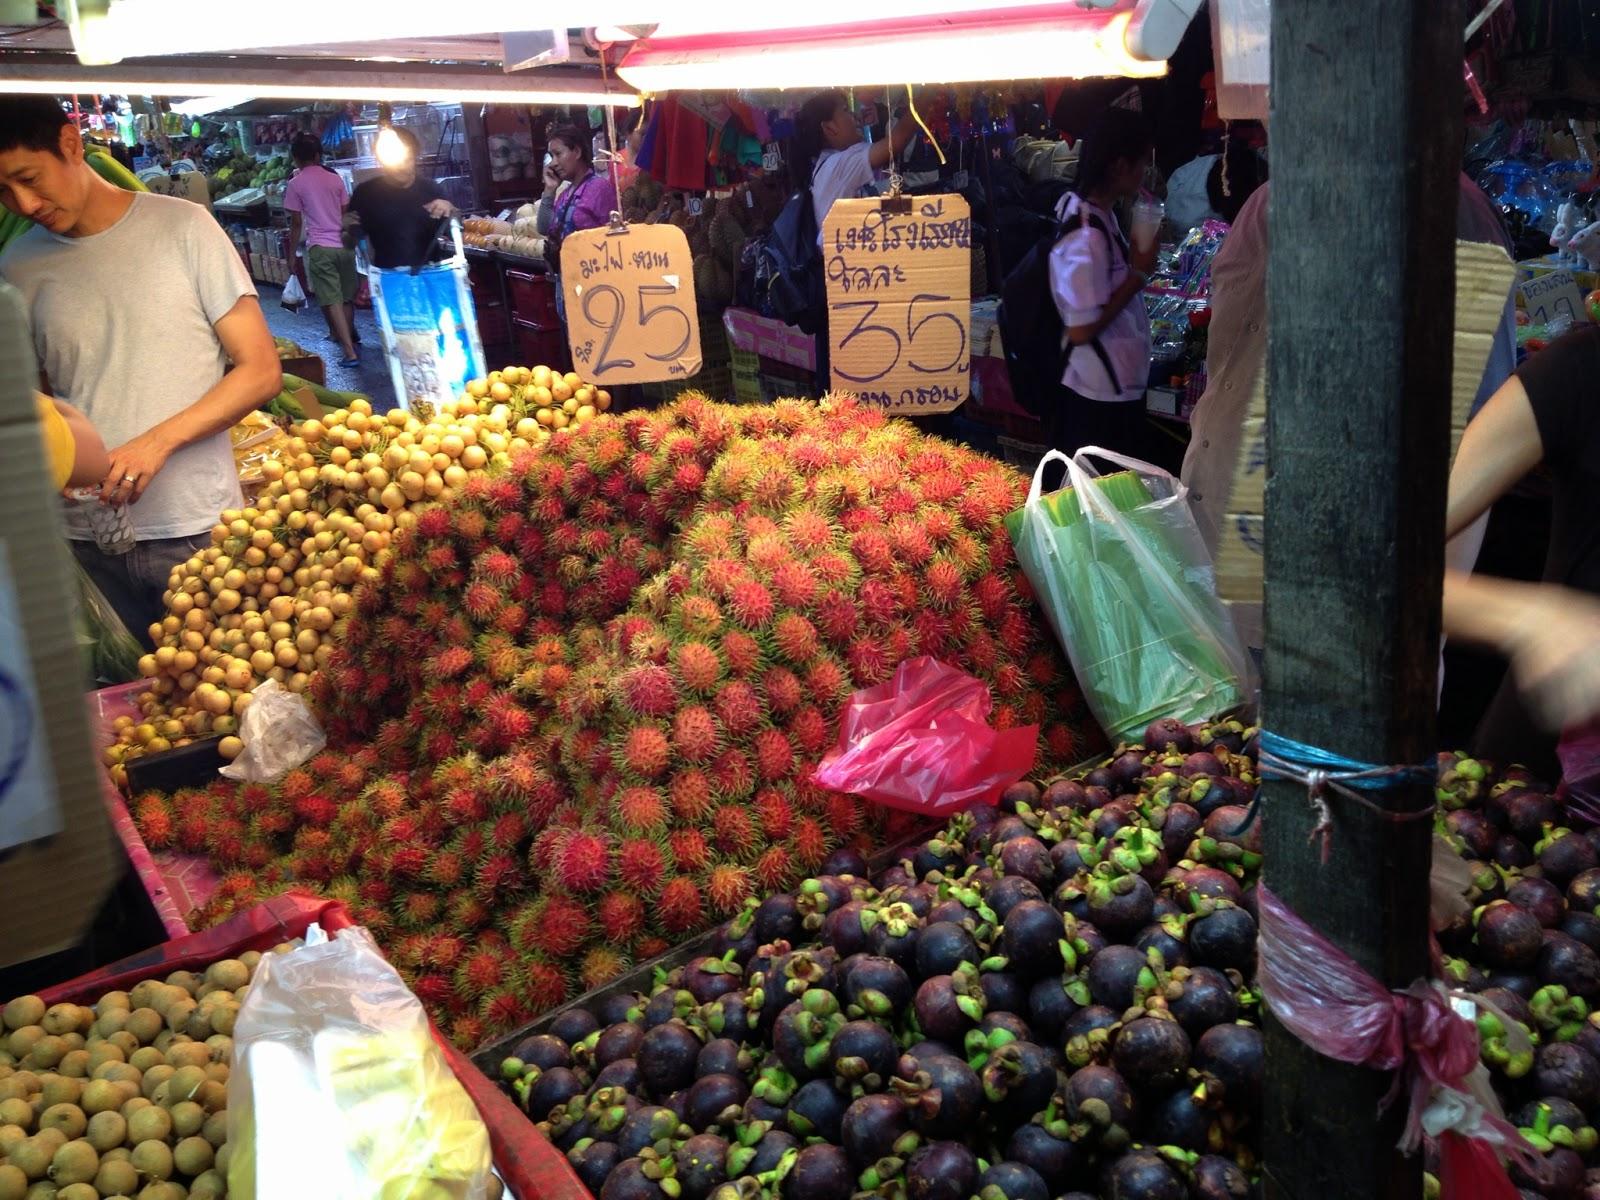 Bangkok - Wet market - mangosteen and rambutan